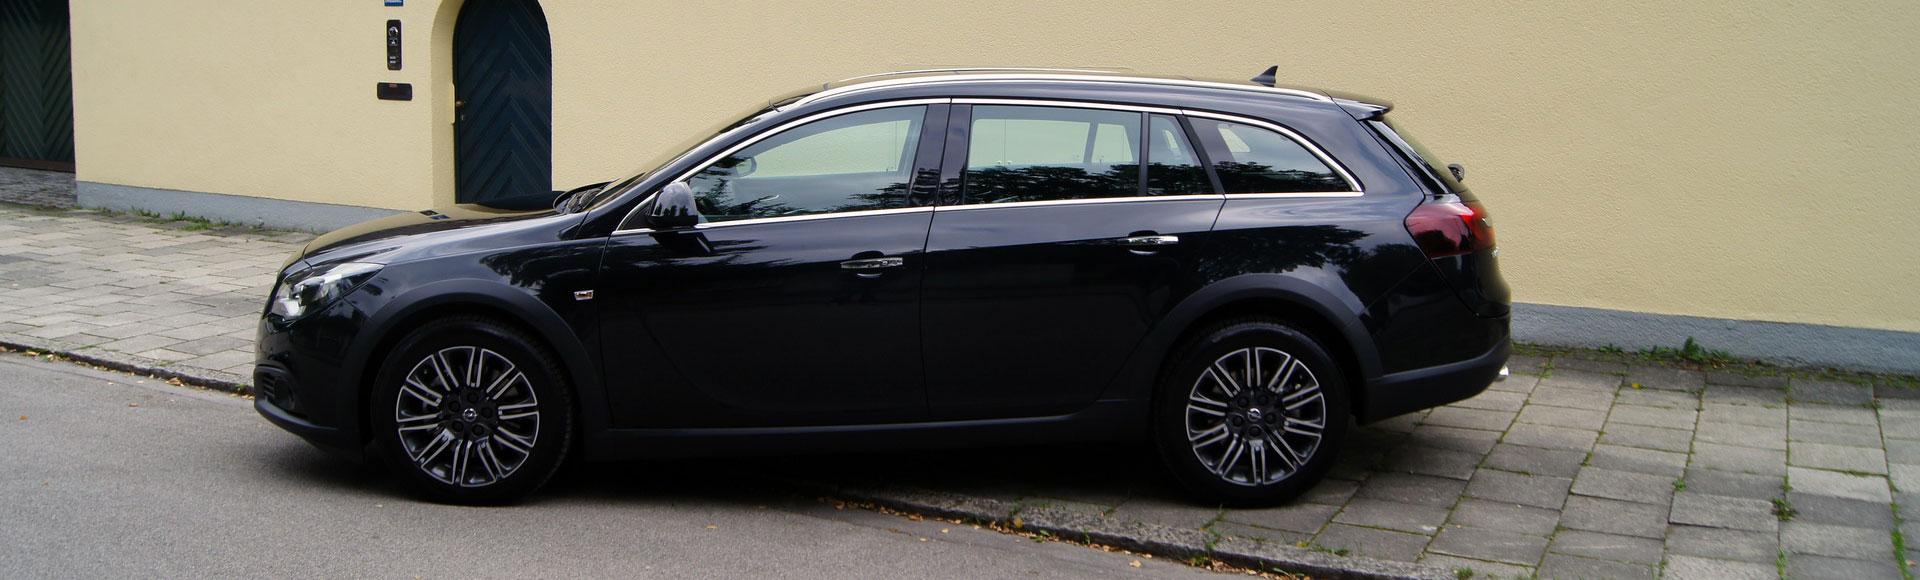 Opel Insignia 2014 Herbst 8677